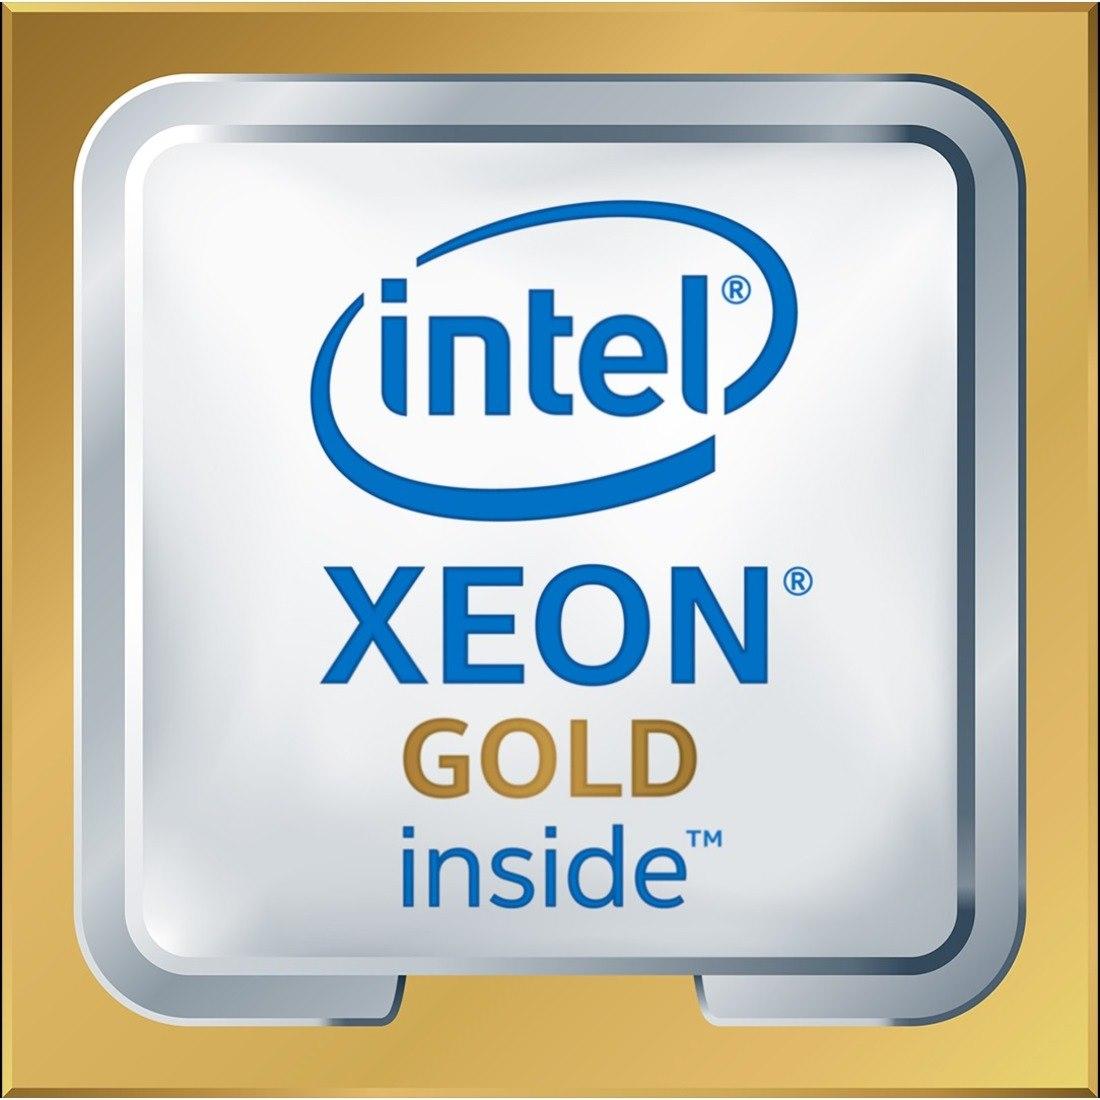 Lenovo Intel Xeon 5120 Tetradeca-core (14 Core) 2.20 GHz Processor Upgrade